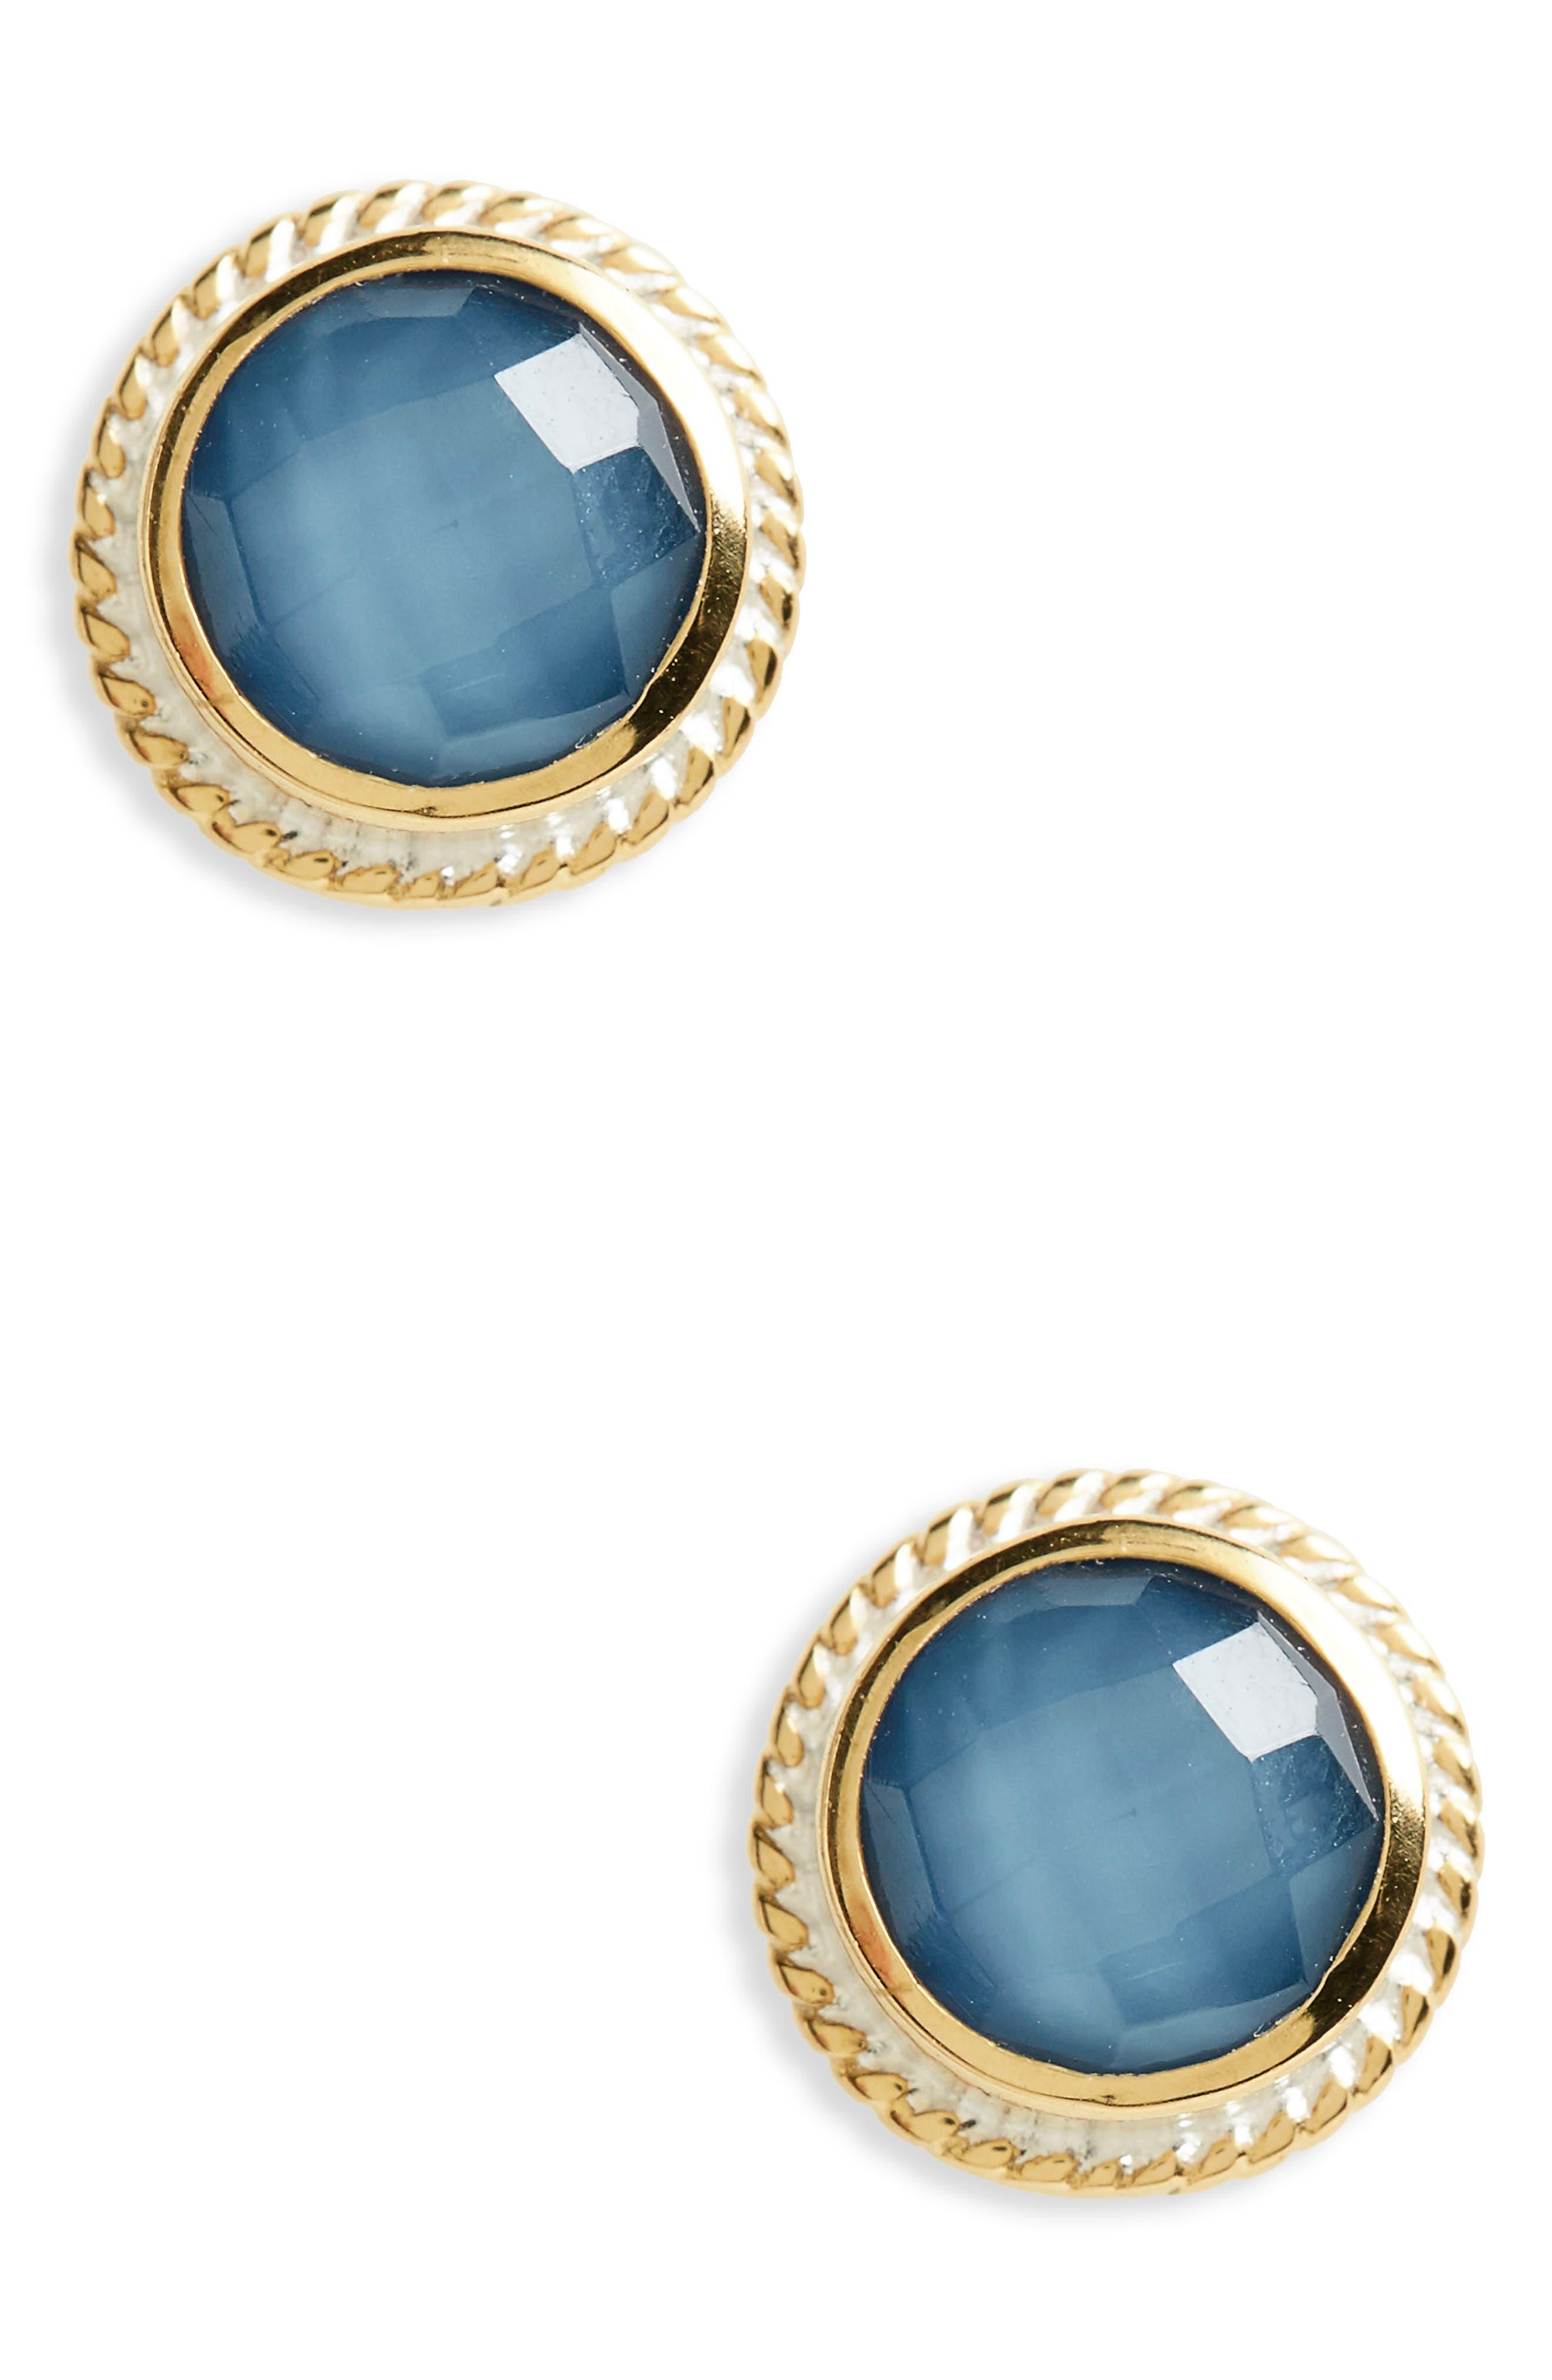 Stone Stud Earrings,                         Main,                         color, Gold/ Blue Quartz